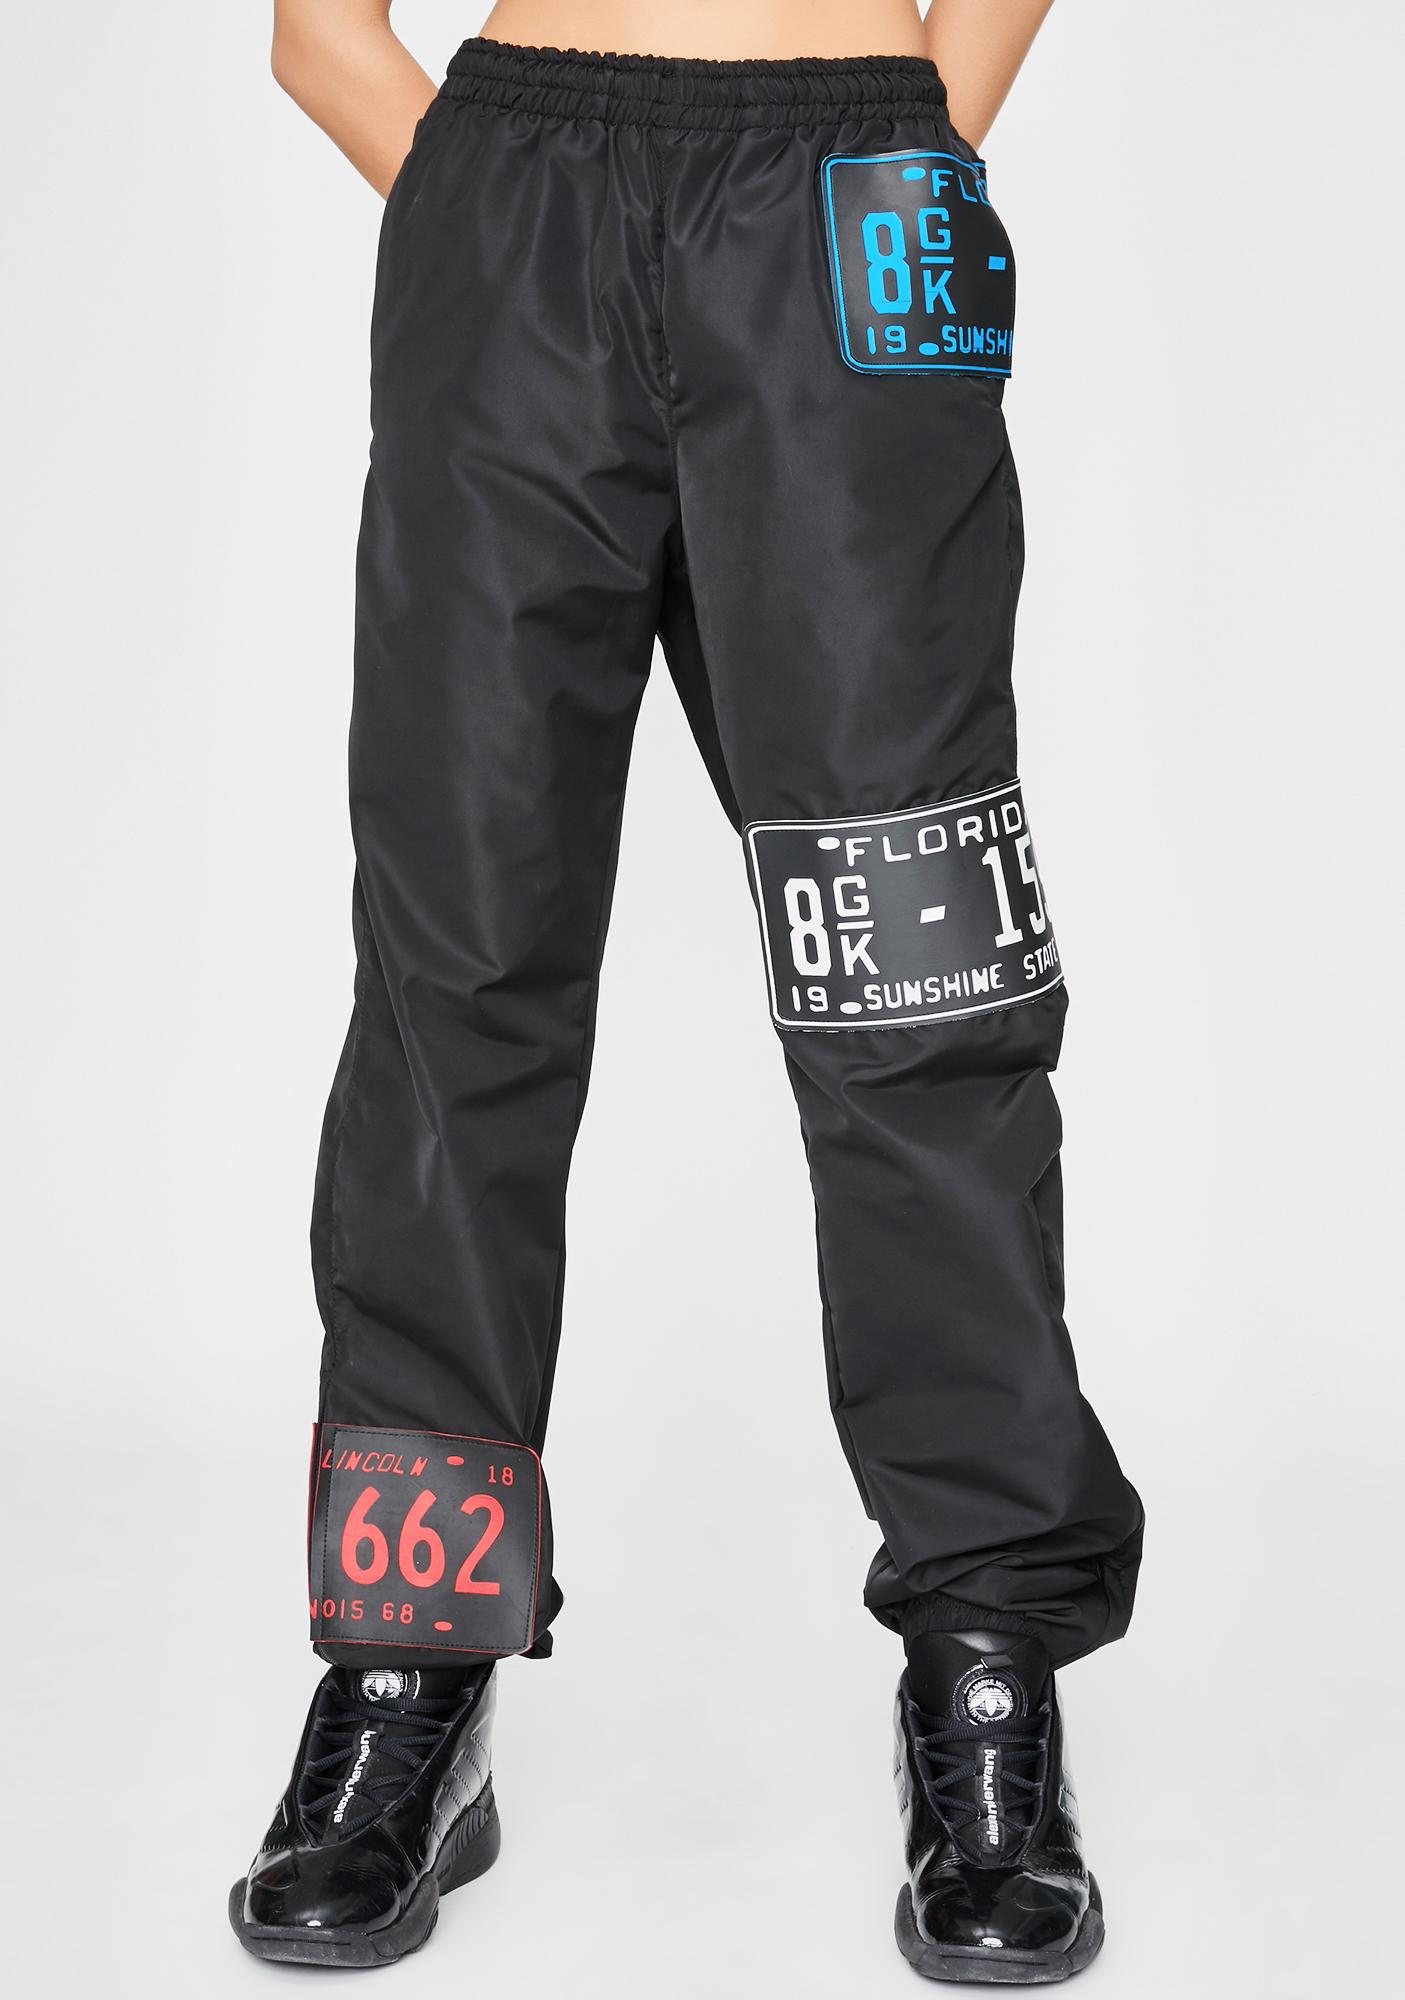 Kiki Riki Licensed Trouble Jogger Sweatpants